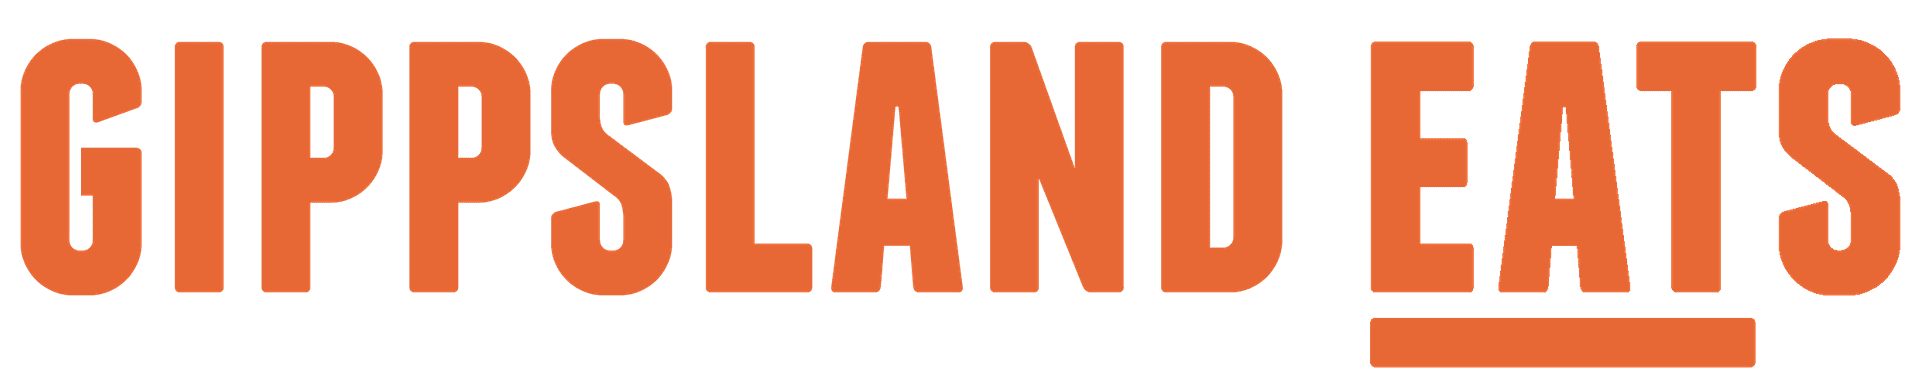 Gippsland Eats logo